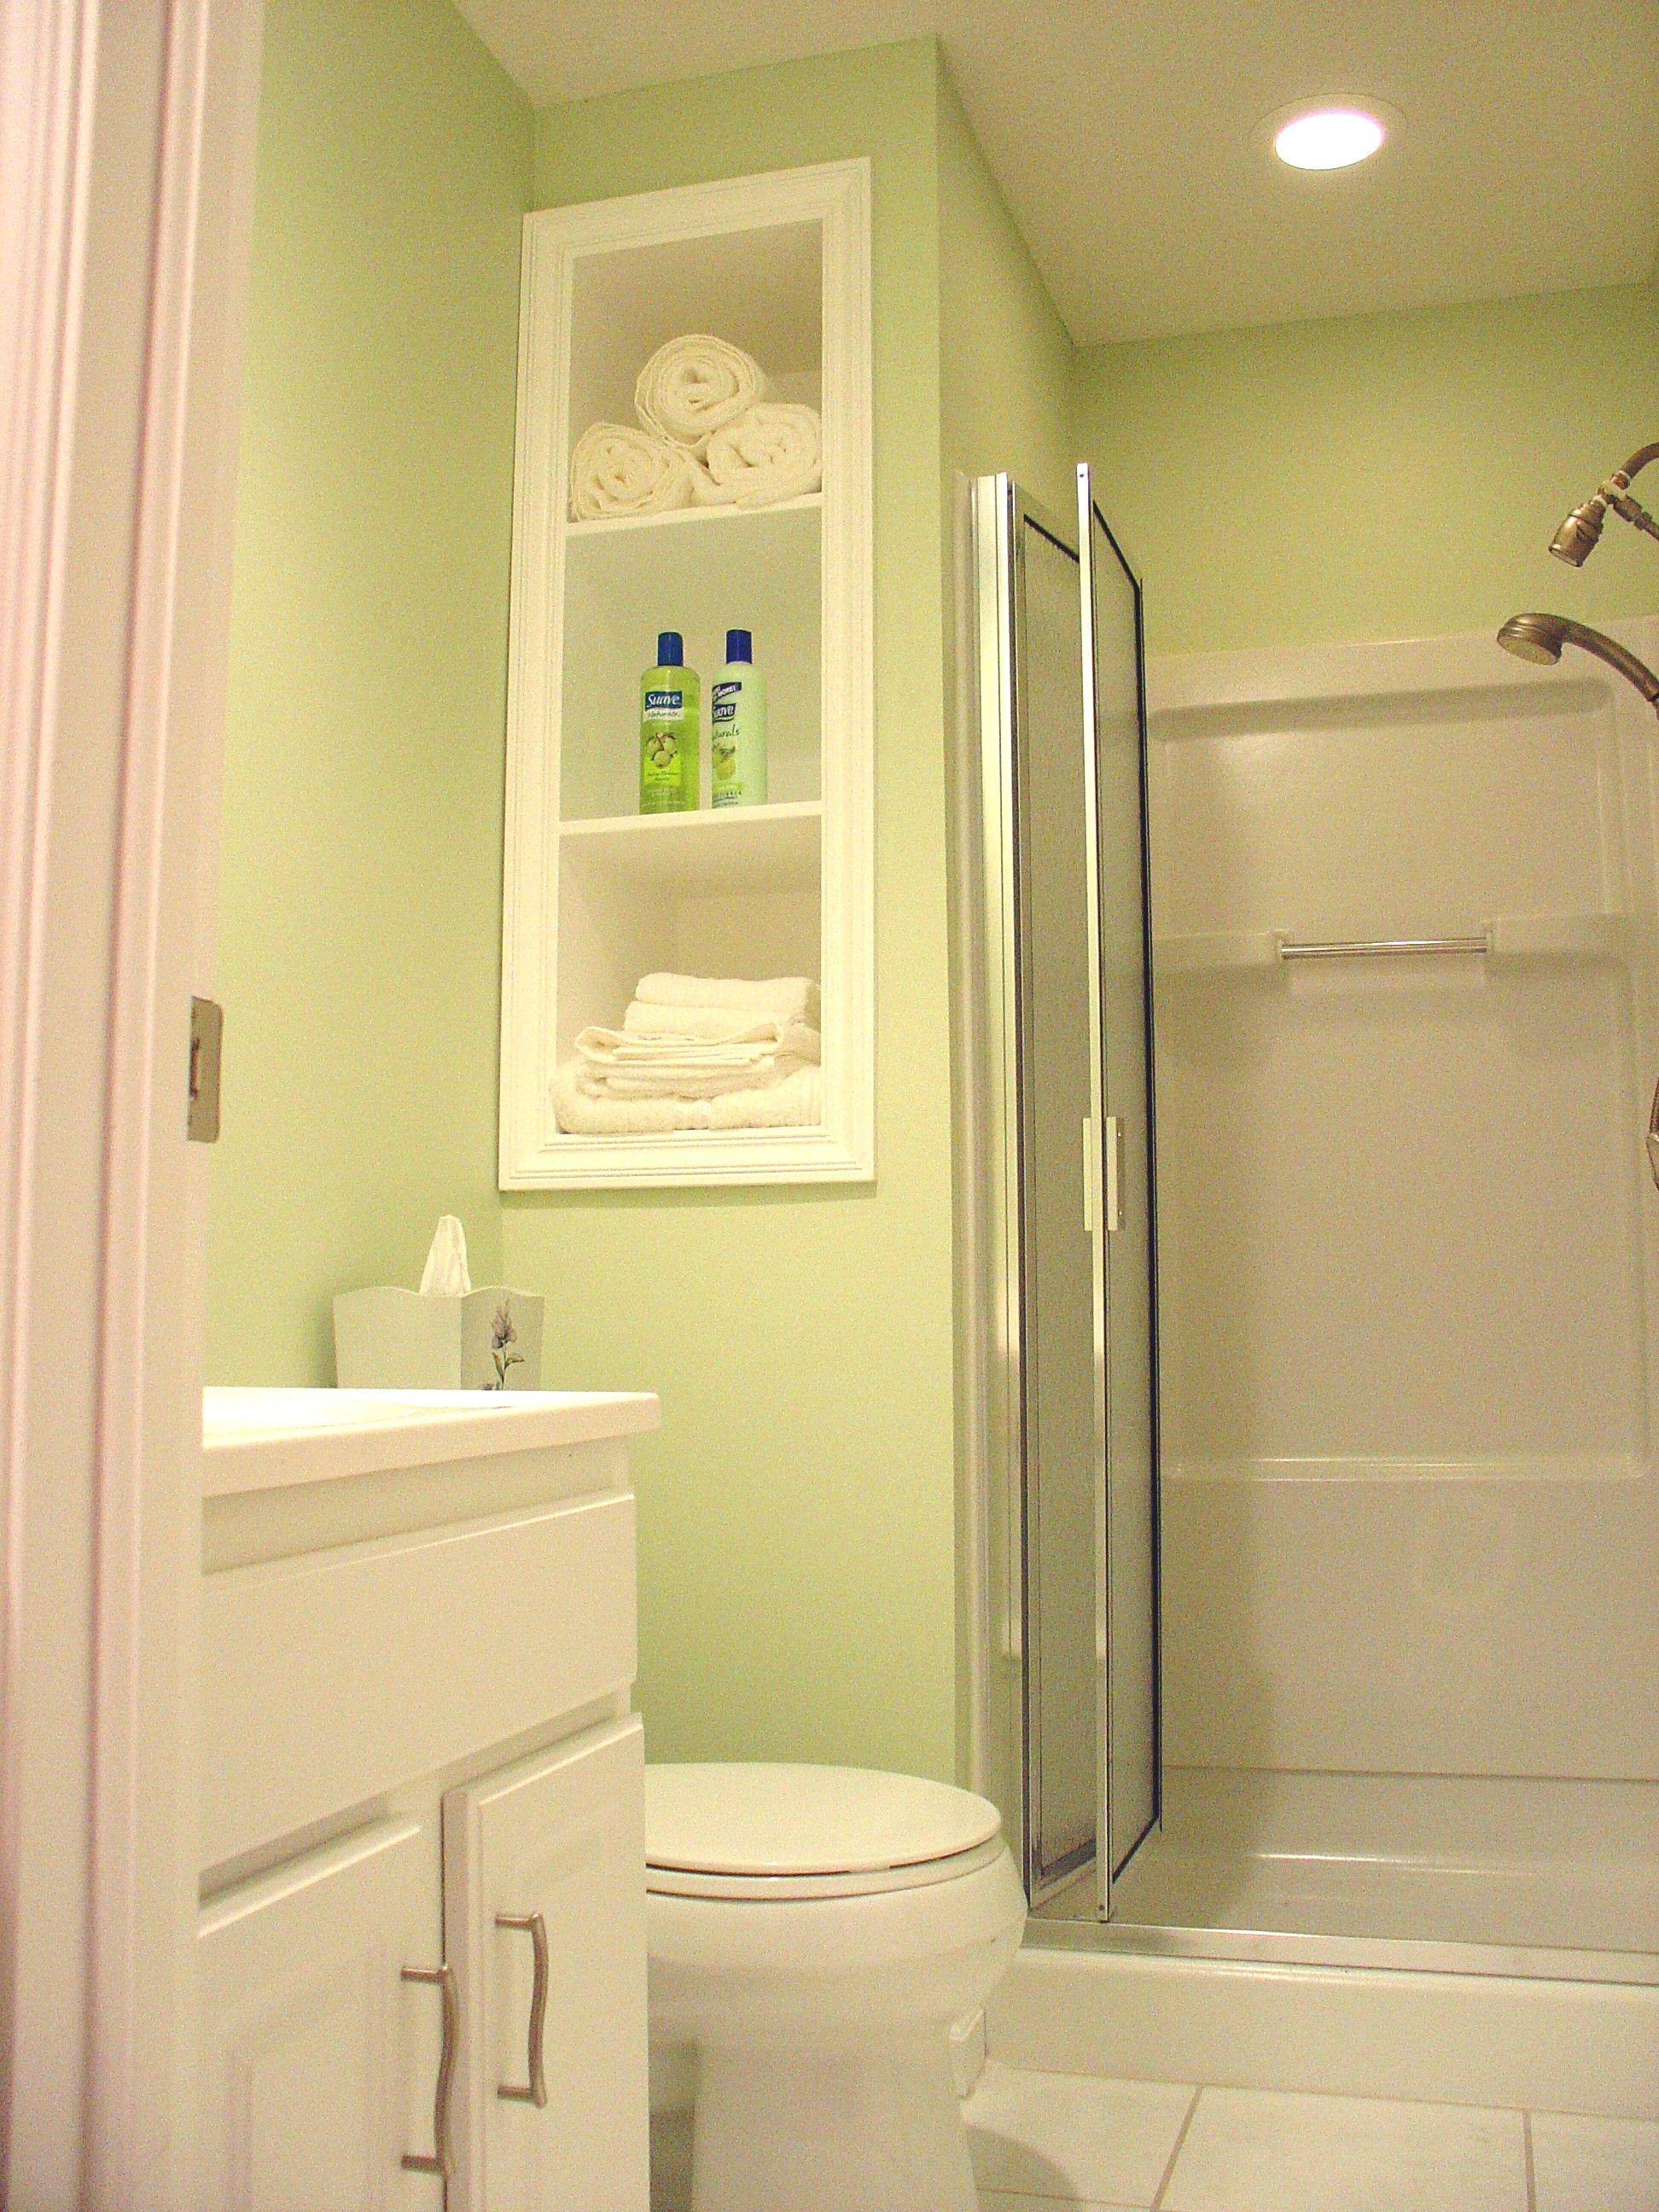 Built In Wall Shelves Plans Bathroom Today S Basement Bathrooms